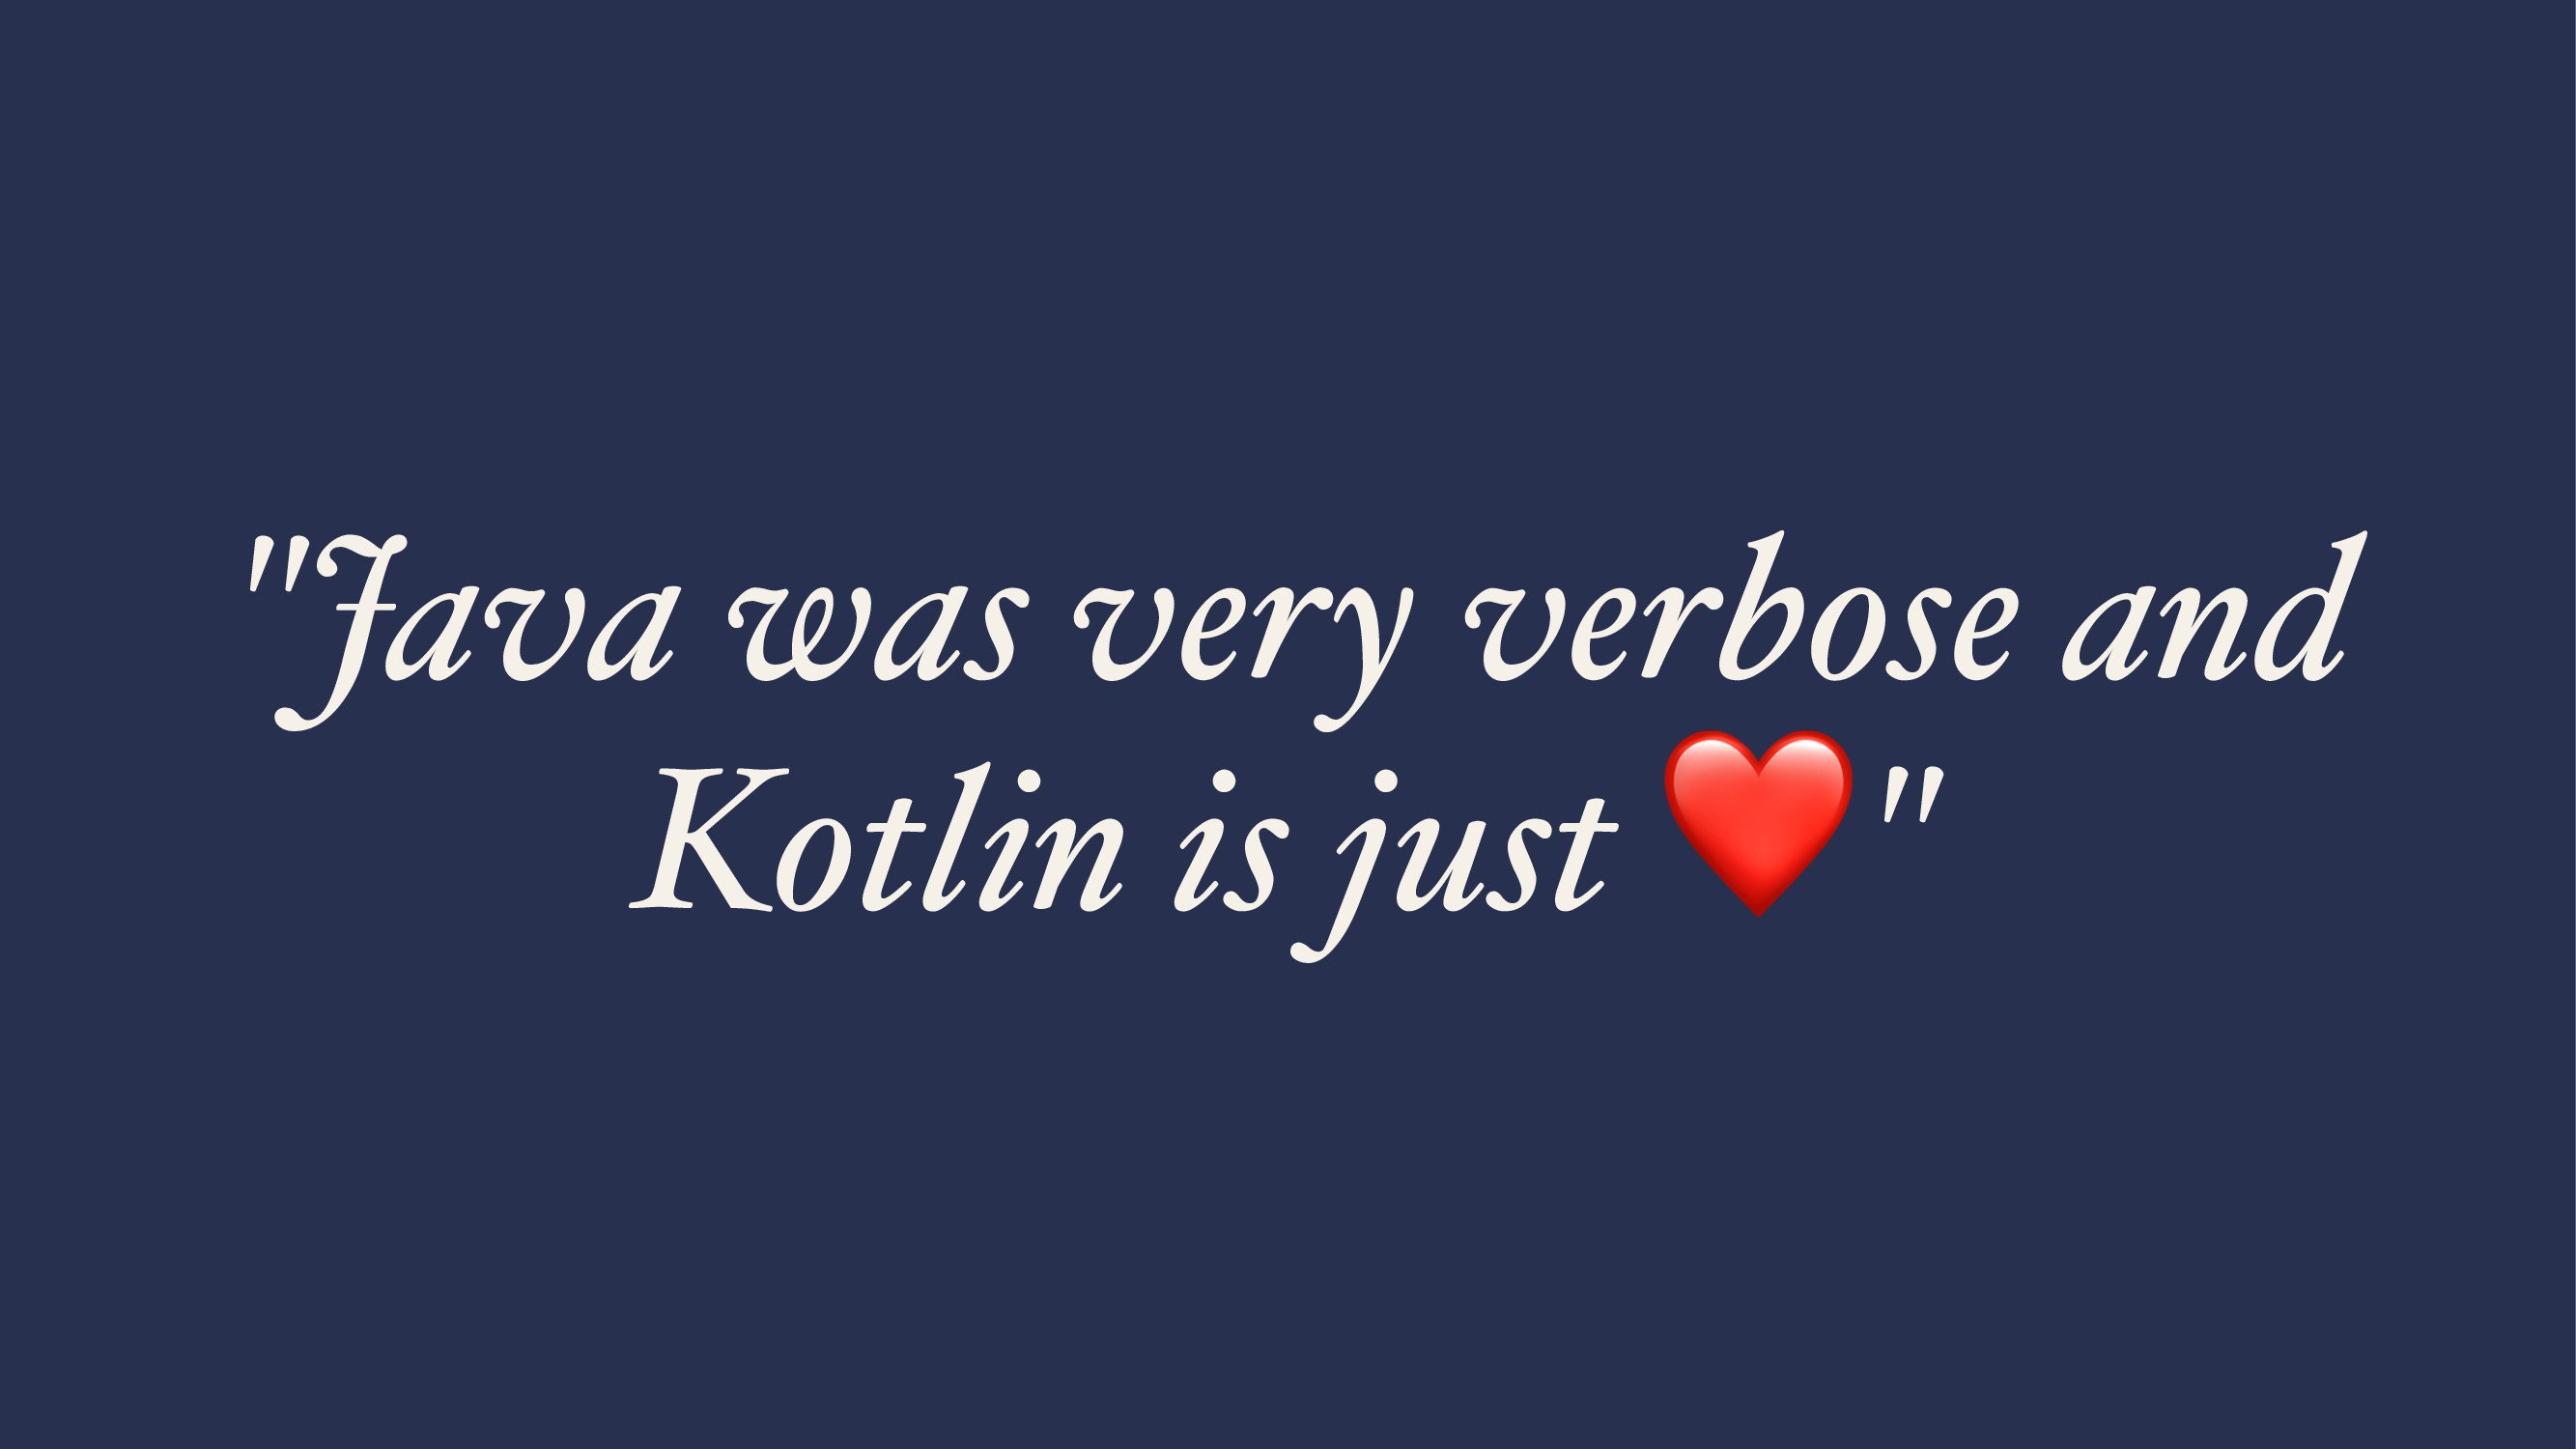 """Java was very verbose and Kotlin is just """